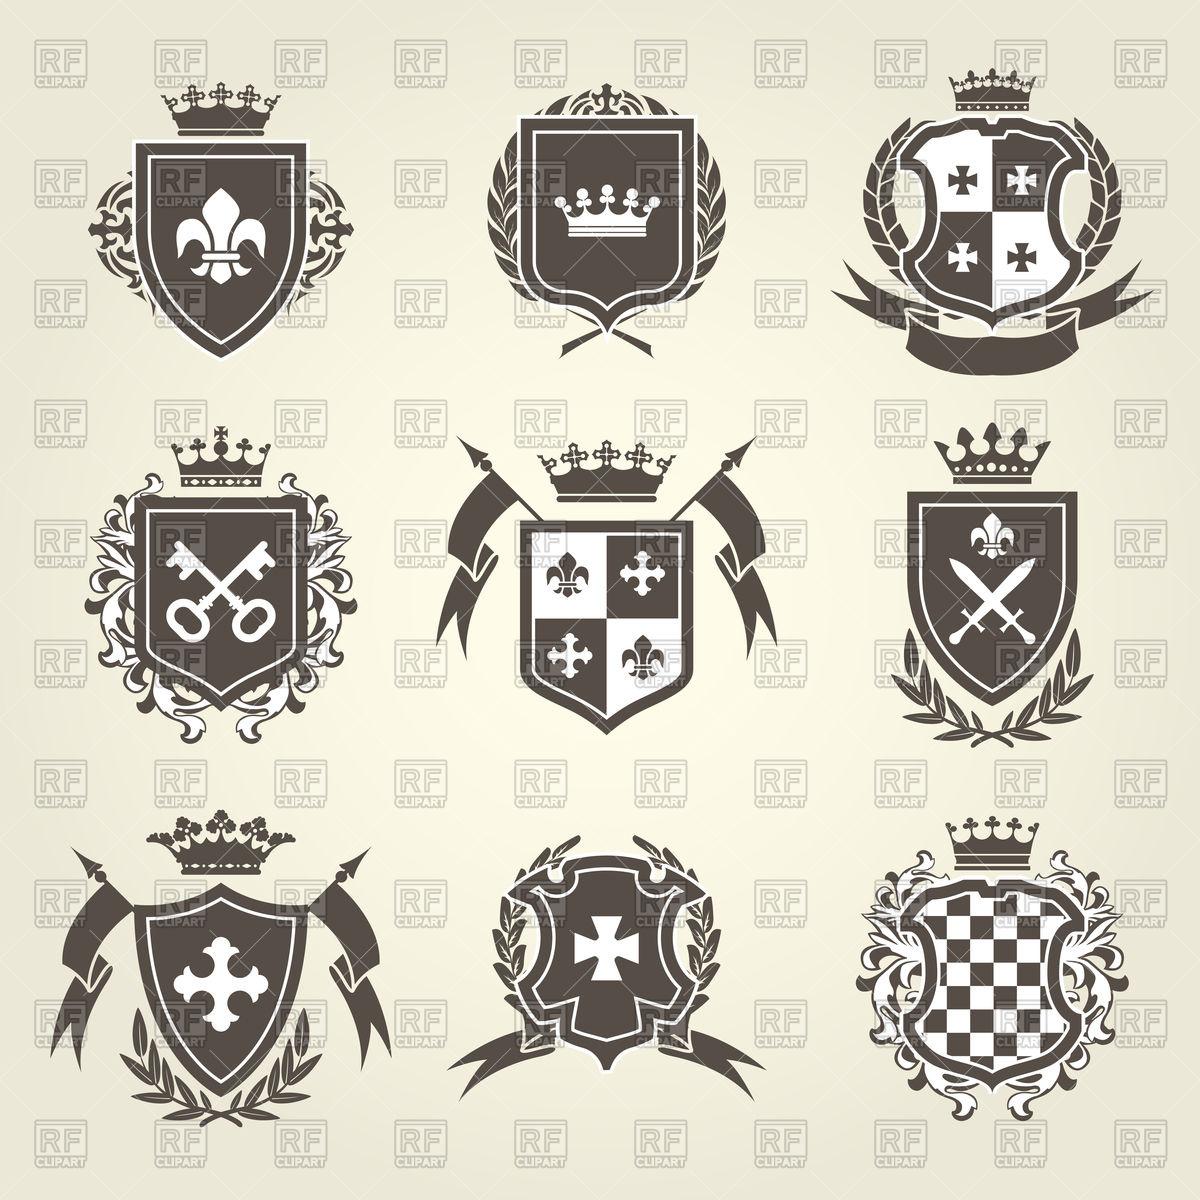 1200x1200 Shield Clipart Royal Crest